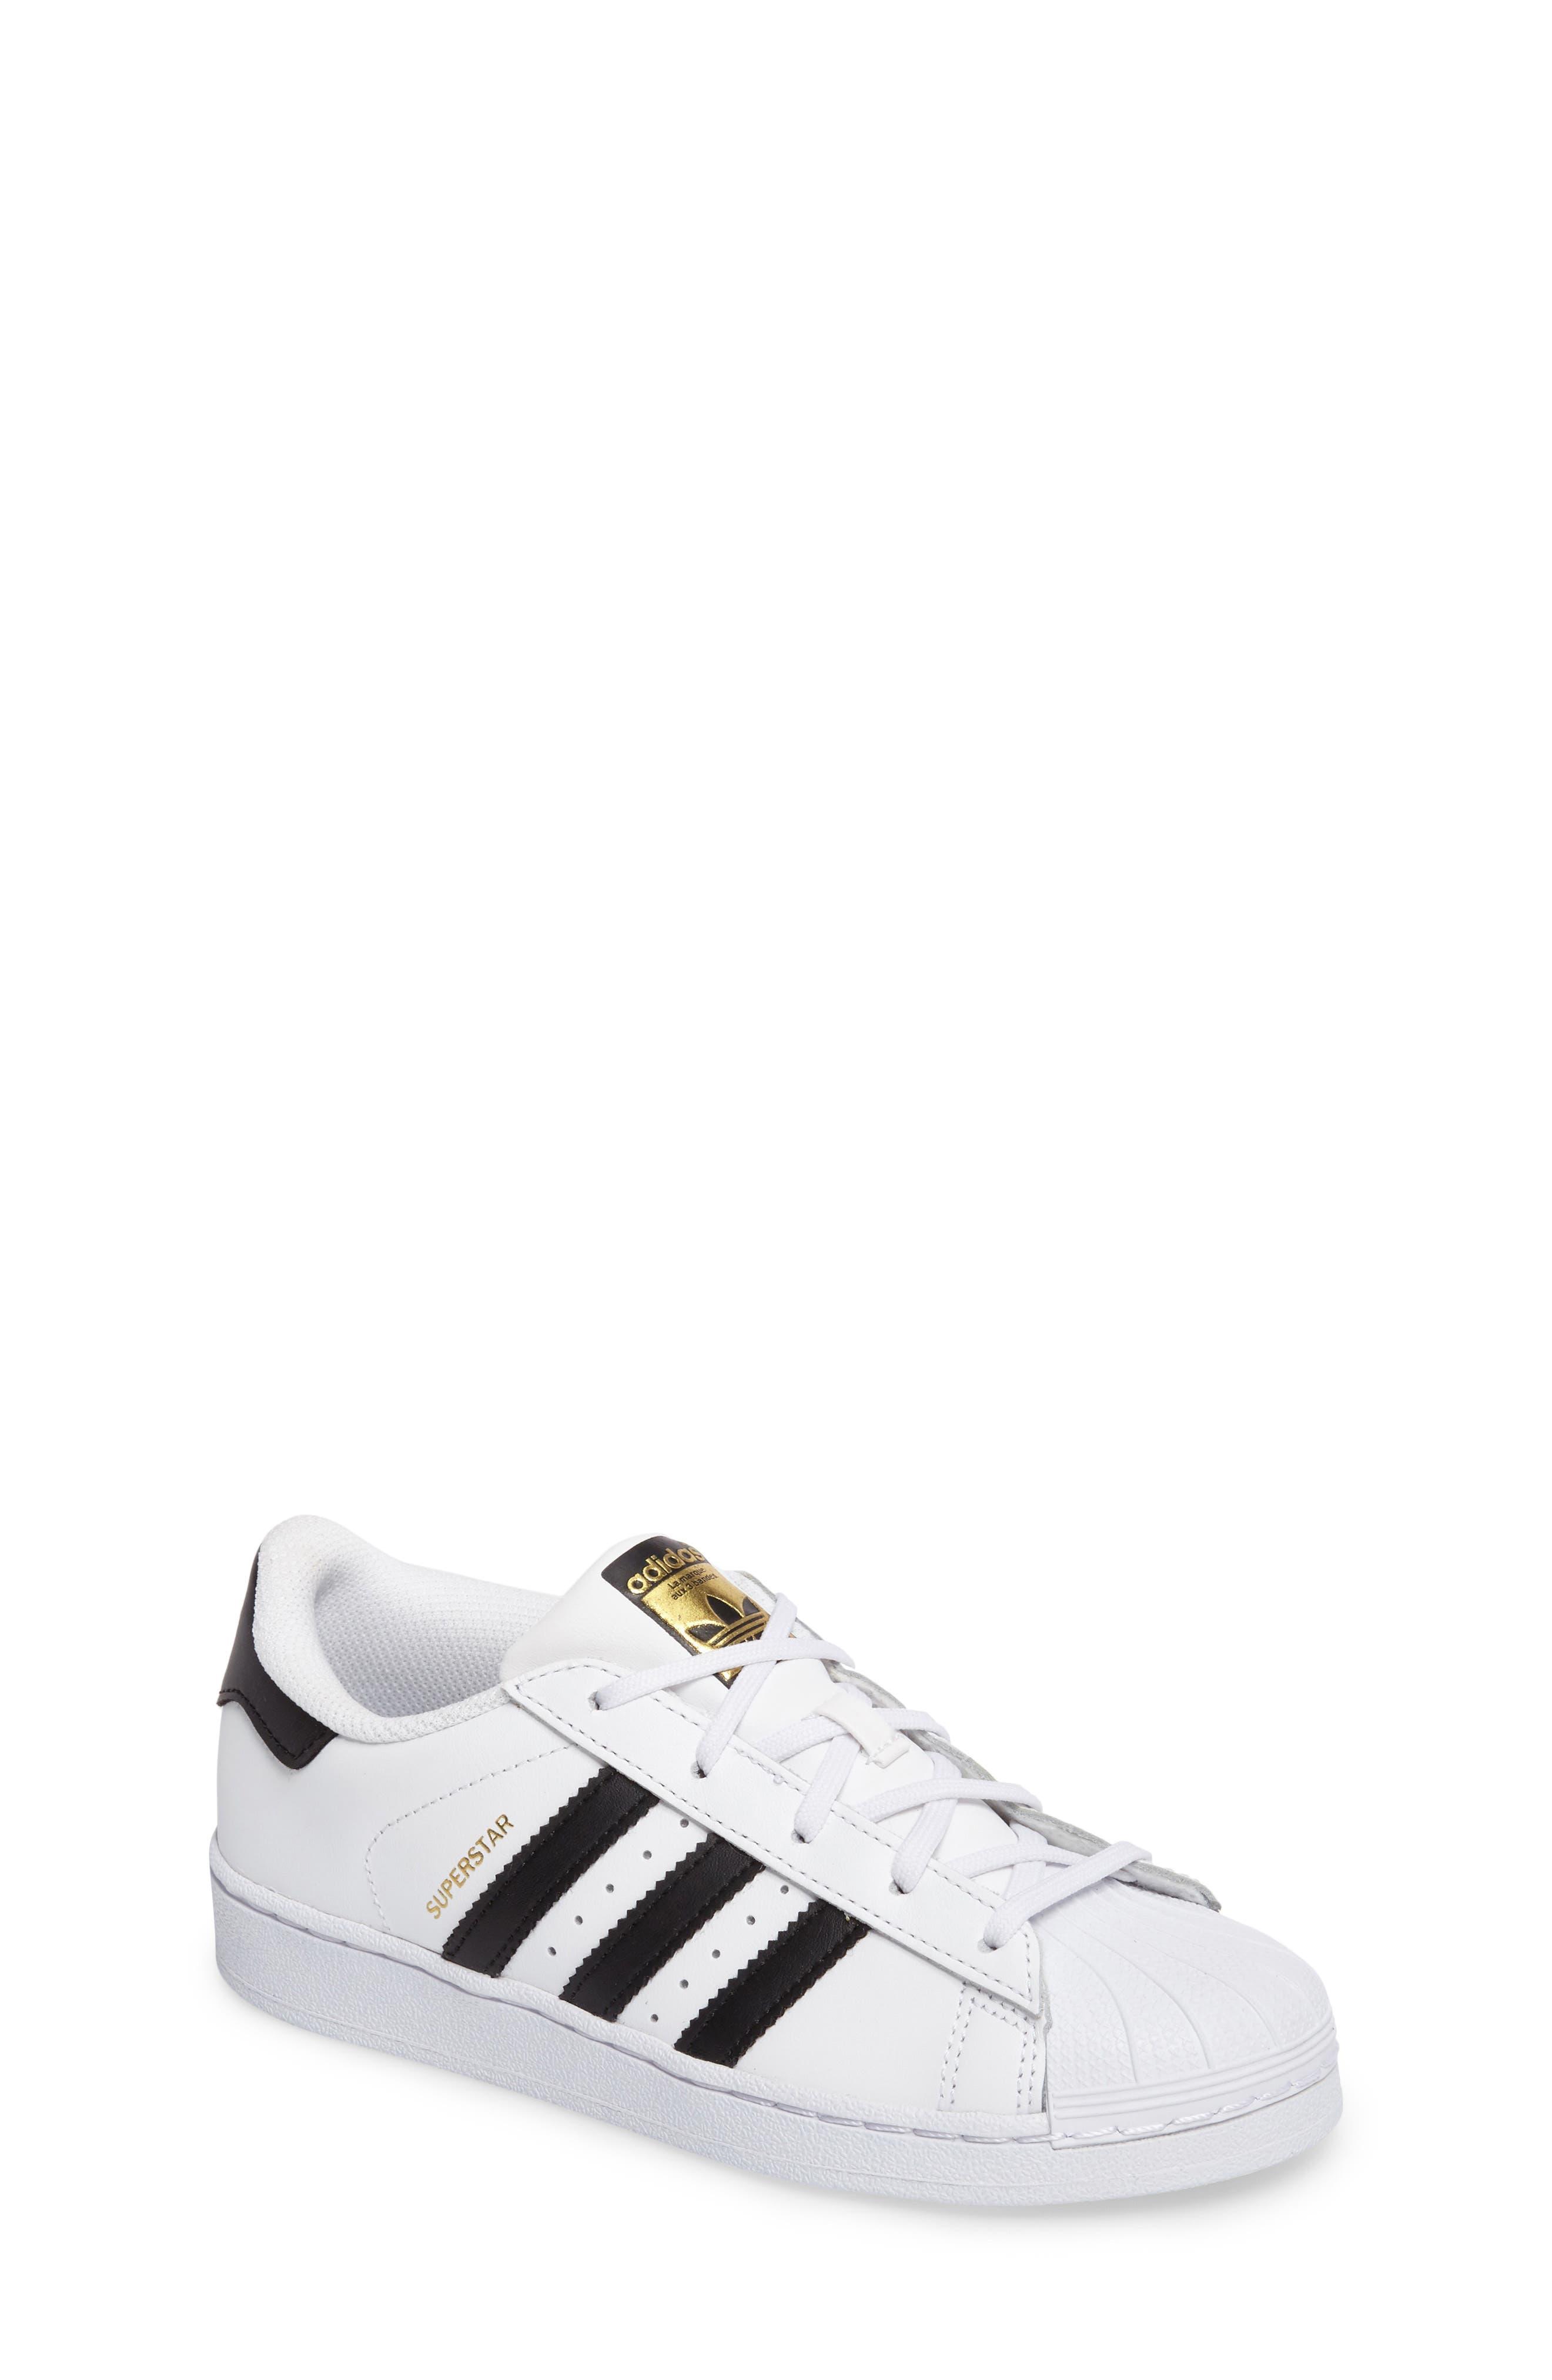 'Superstar Foundation' Sneaker, Main, color, WHITE/ BLACK